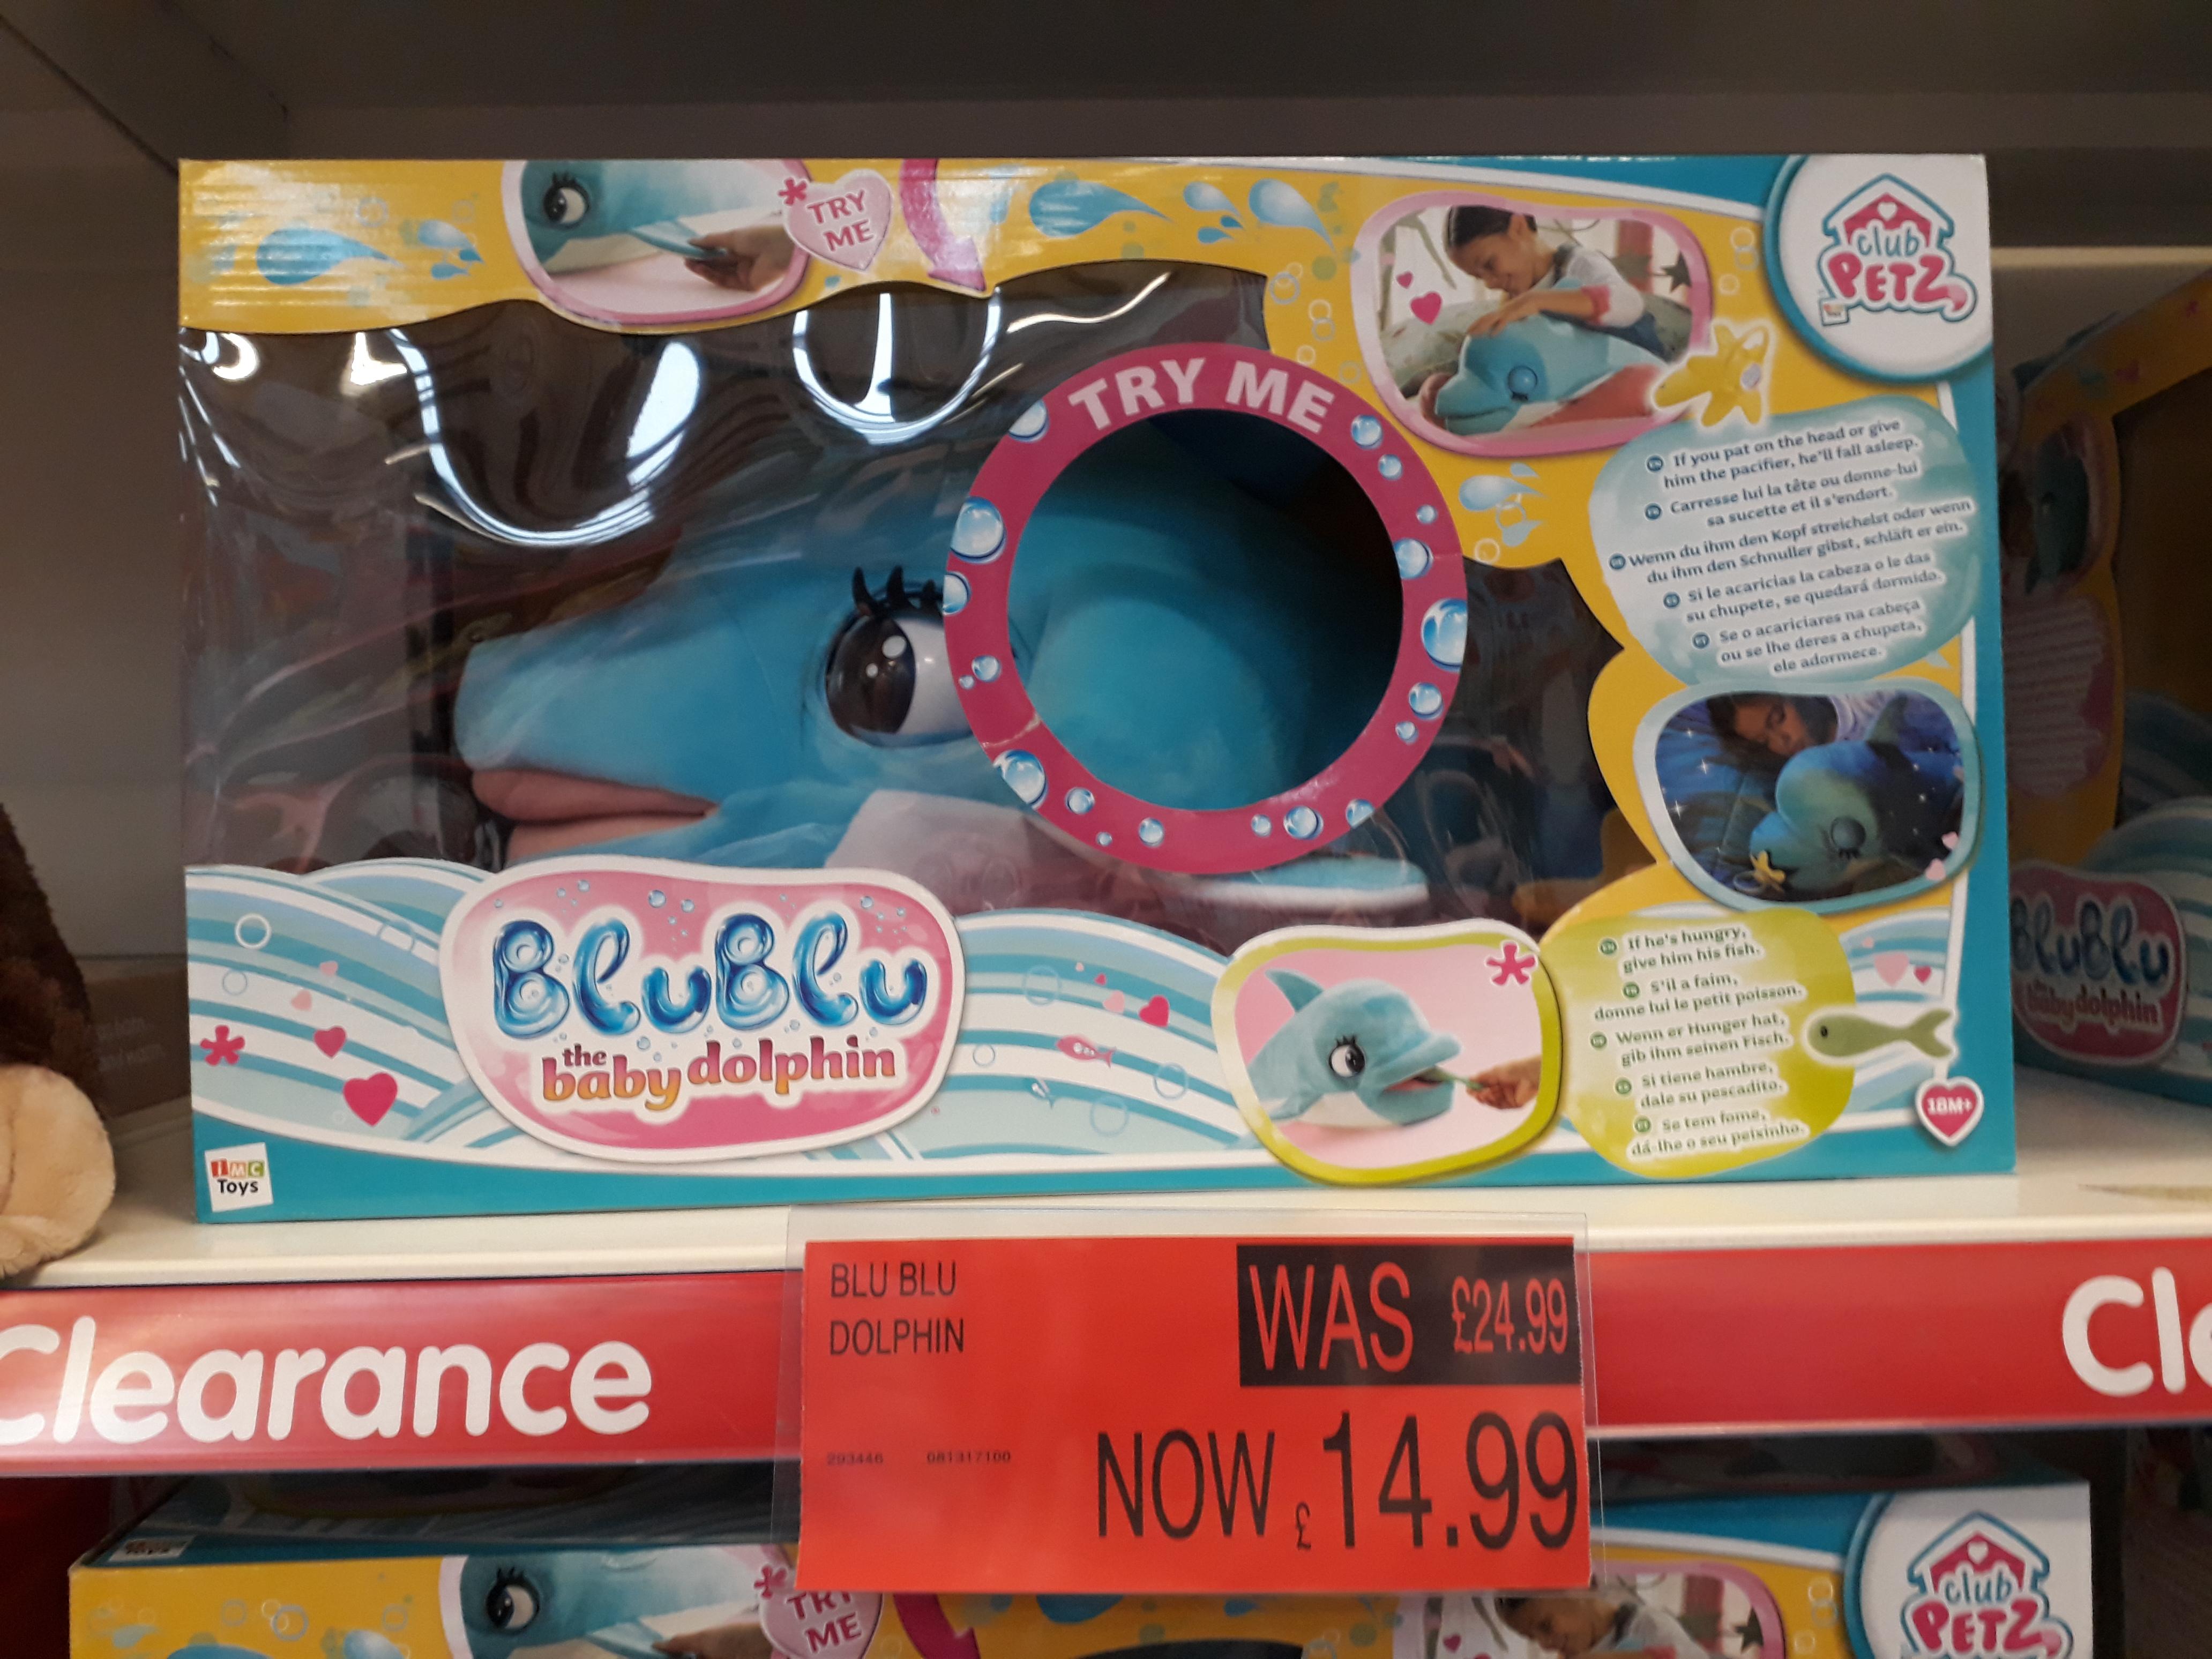 Blu Blu the Dolphin £14.99 B&M In Store Full Size Dolphin (BluBlu)